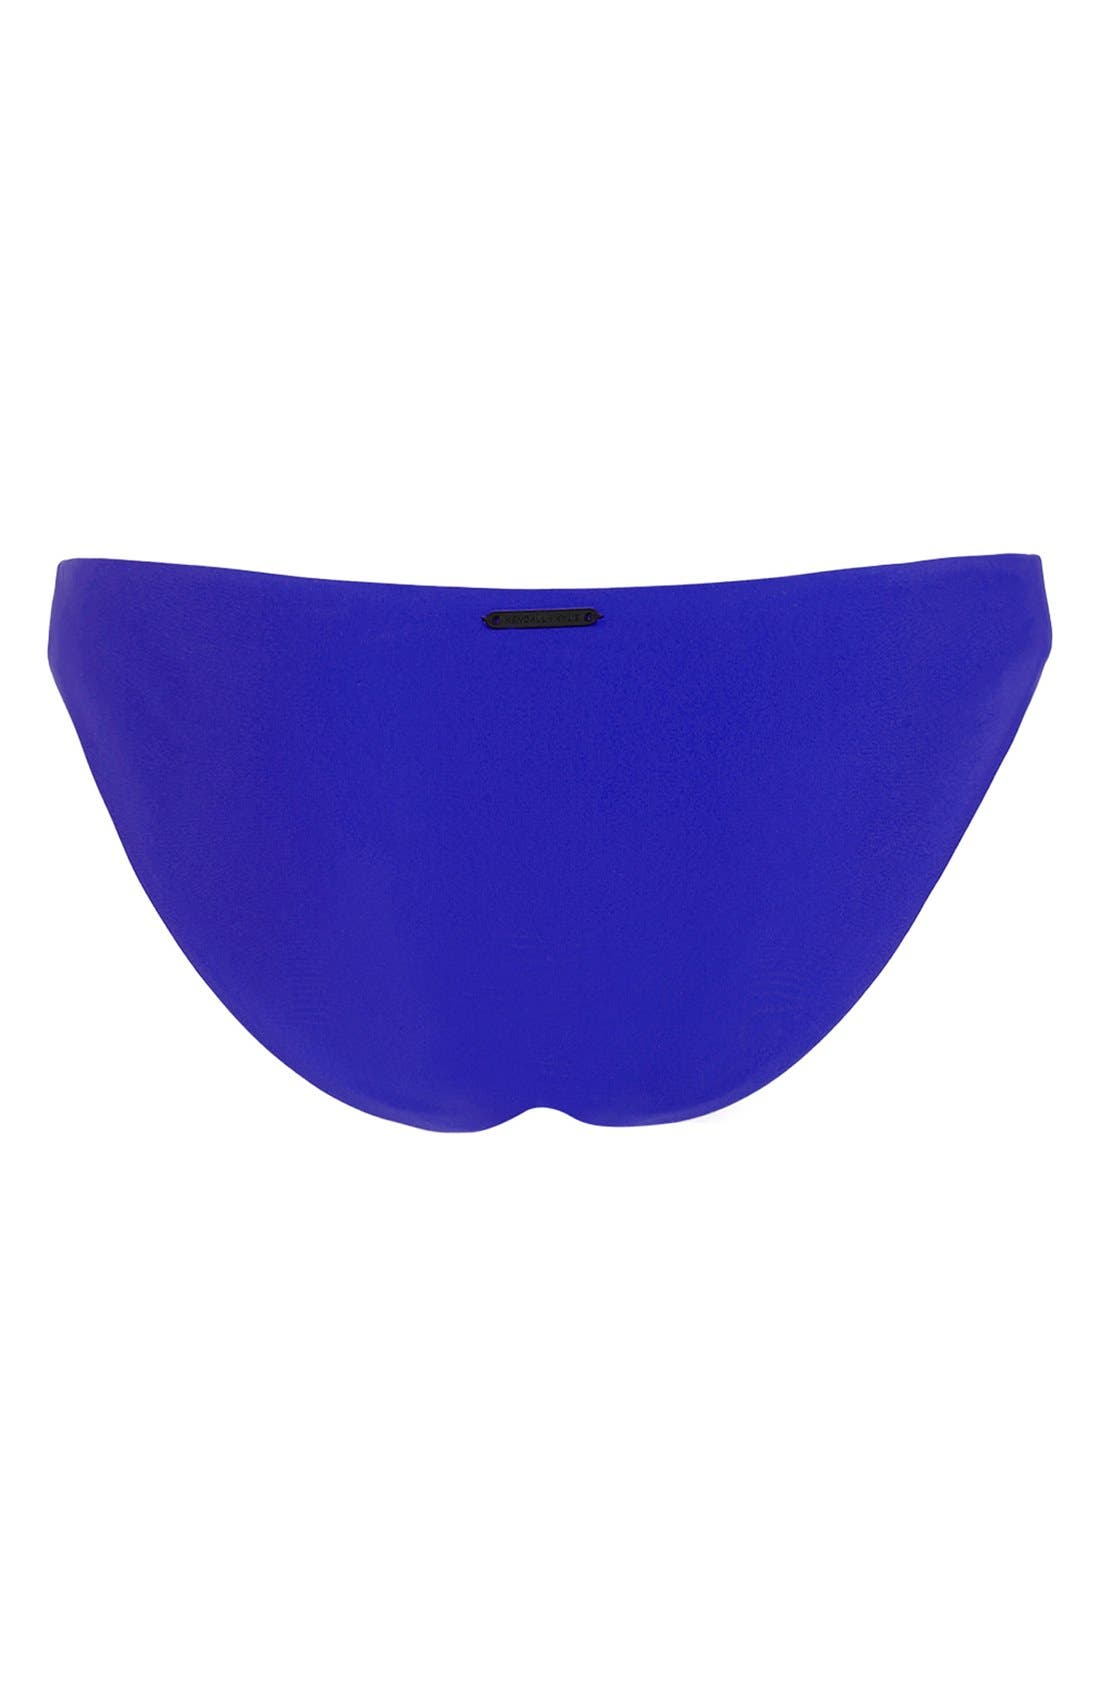 Alternate Image 2  - KENDALL + KYLIE at Topshop Solid Neoprene Bikini Bottoms